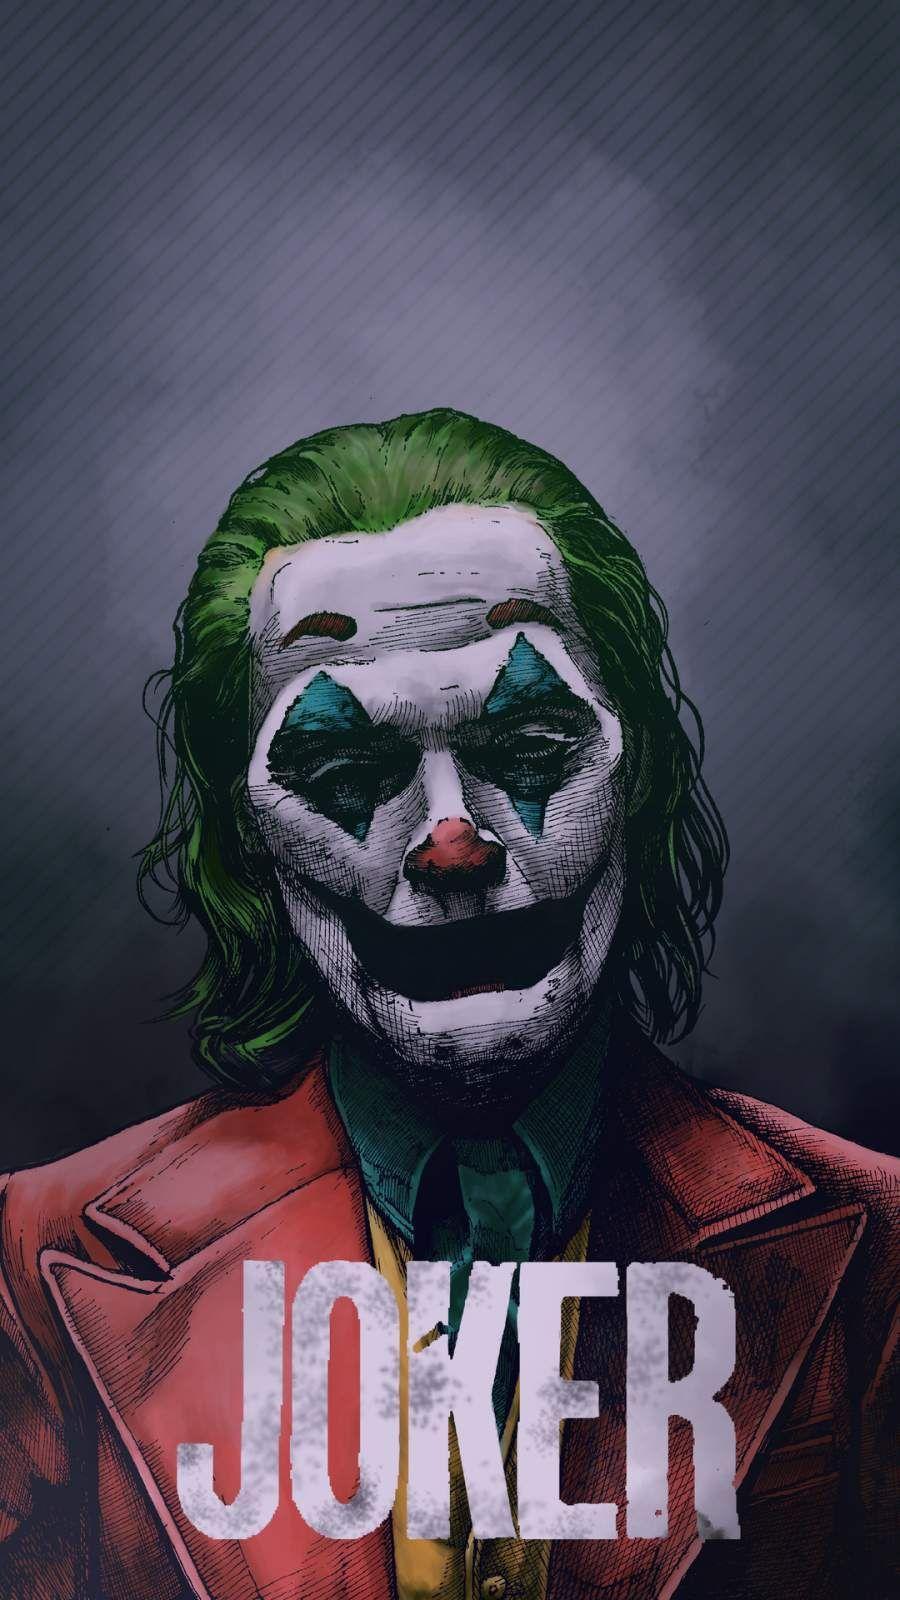 Joker Movie Phone Wallpapers Wallpaper Cave